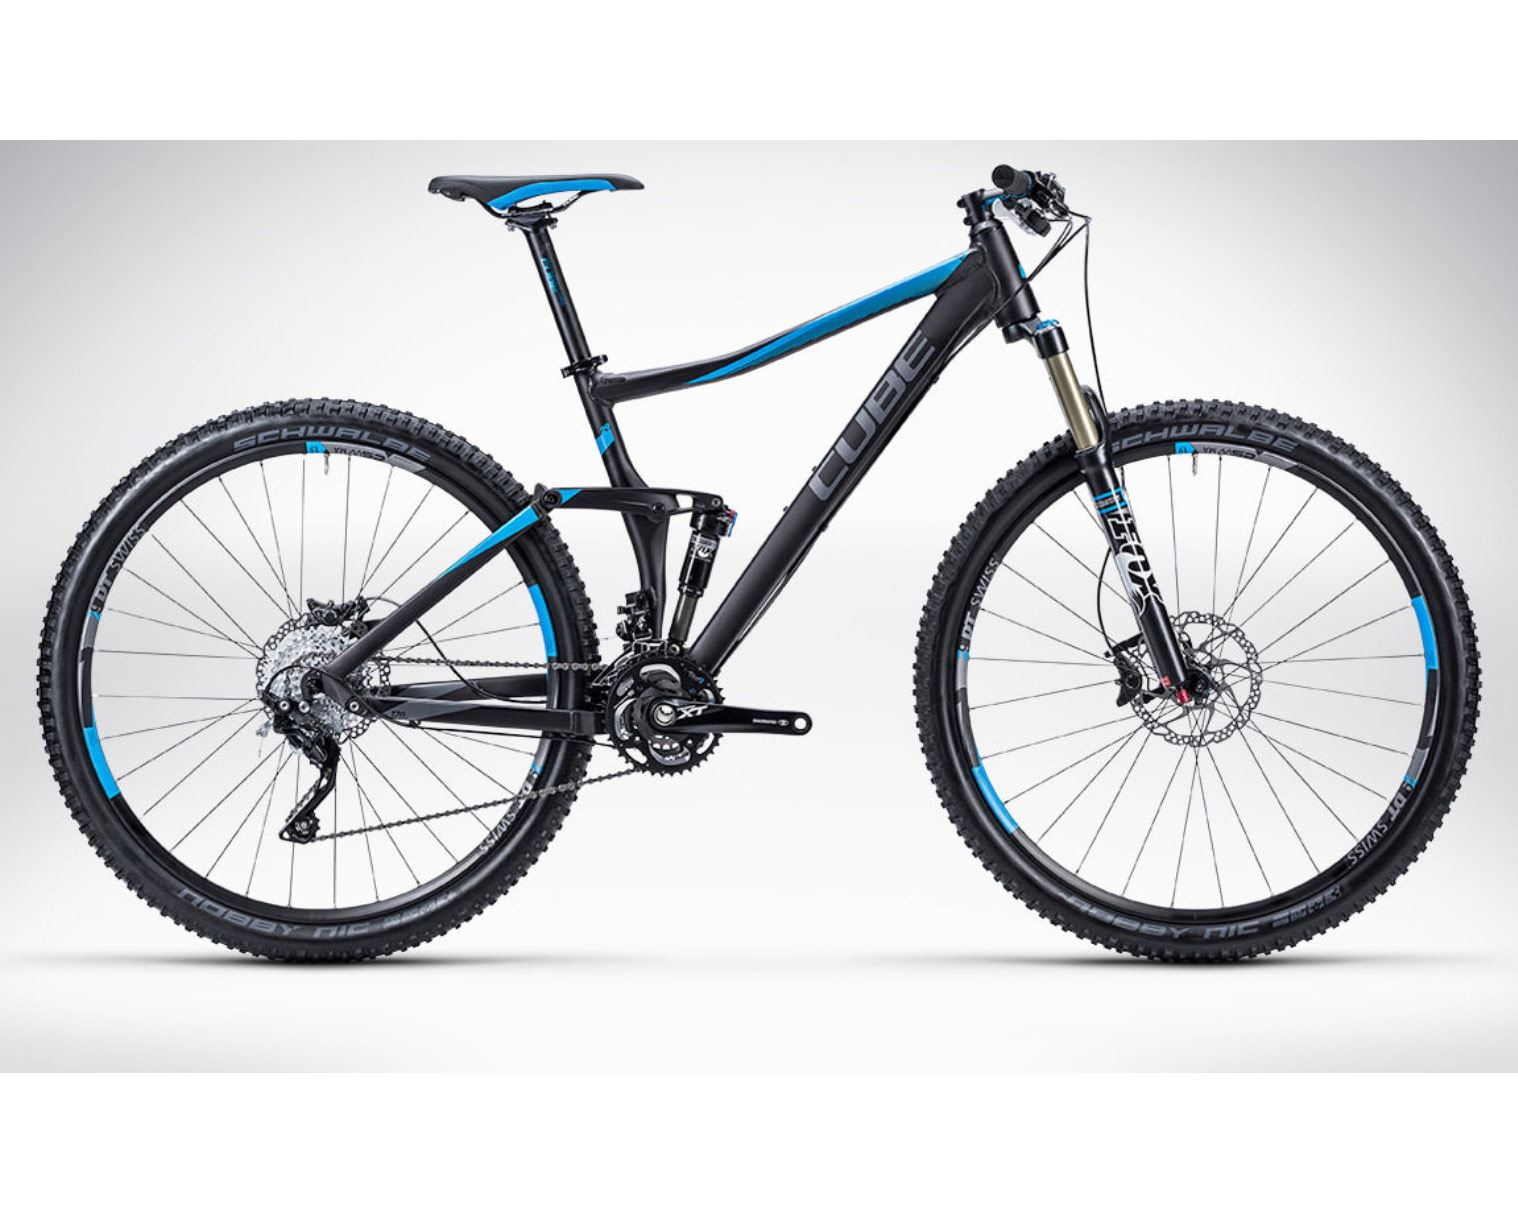 Mountainbike rental / Glød Explorer